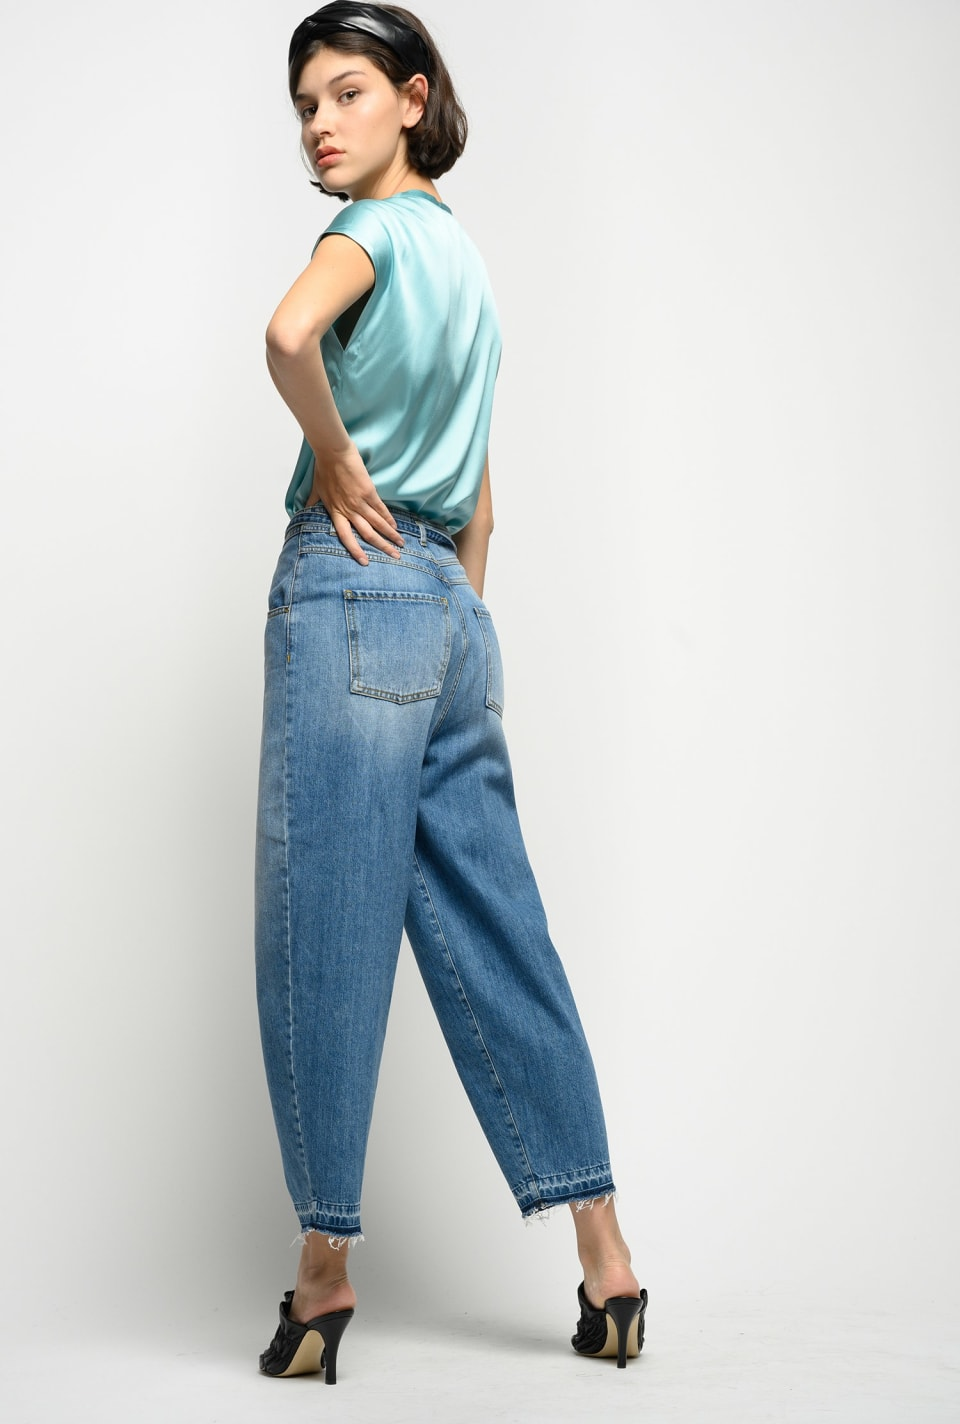 Slouchy jeans in vintage denim - Pinko